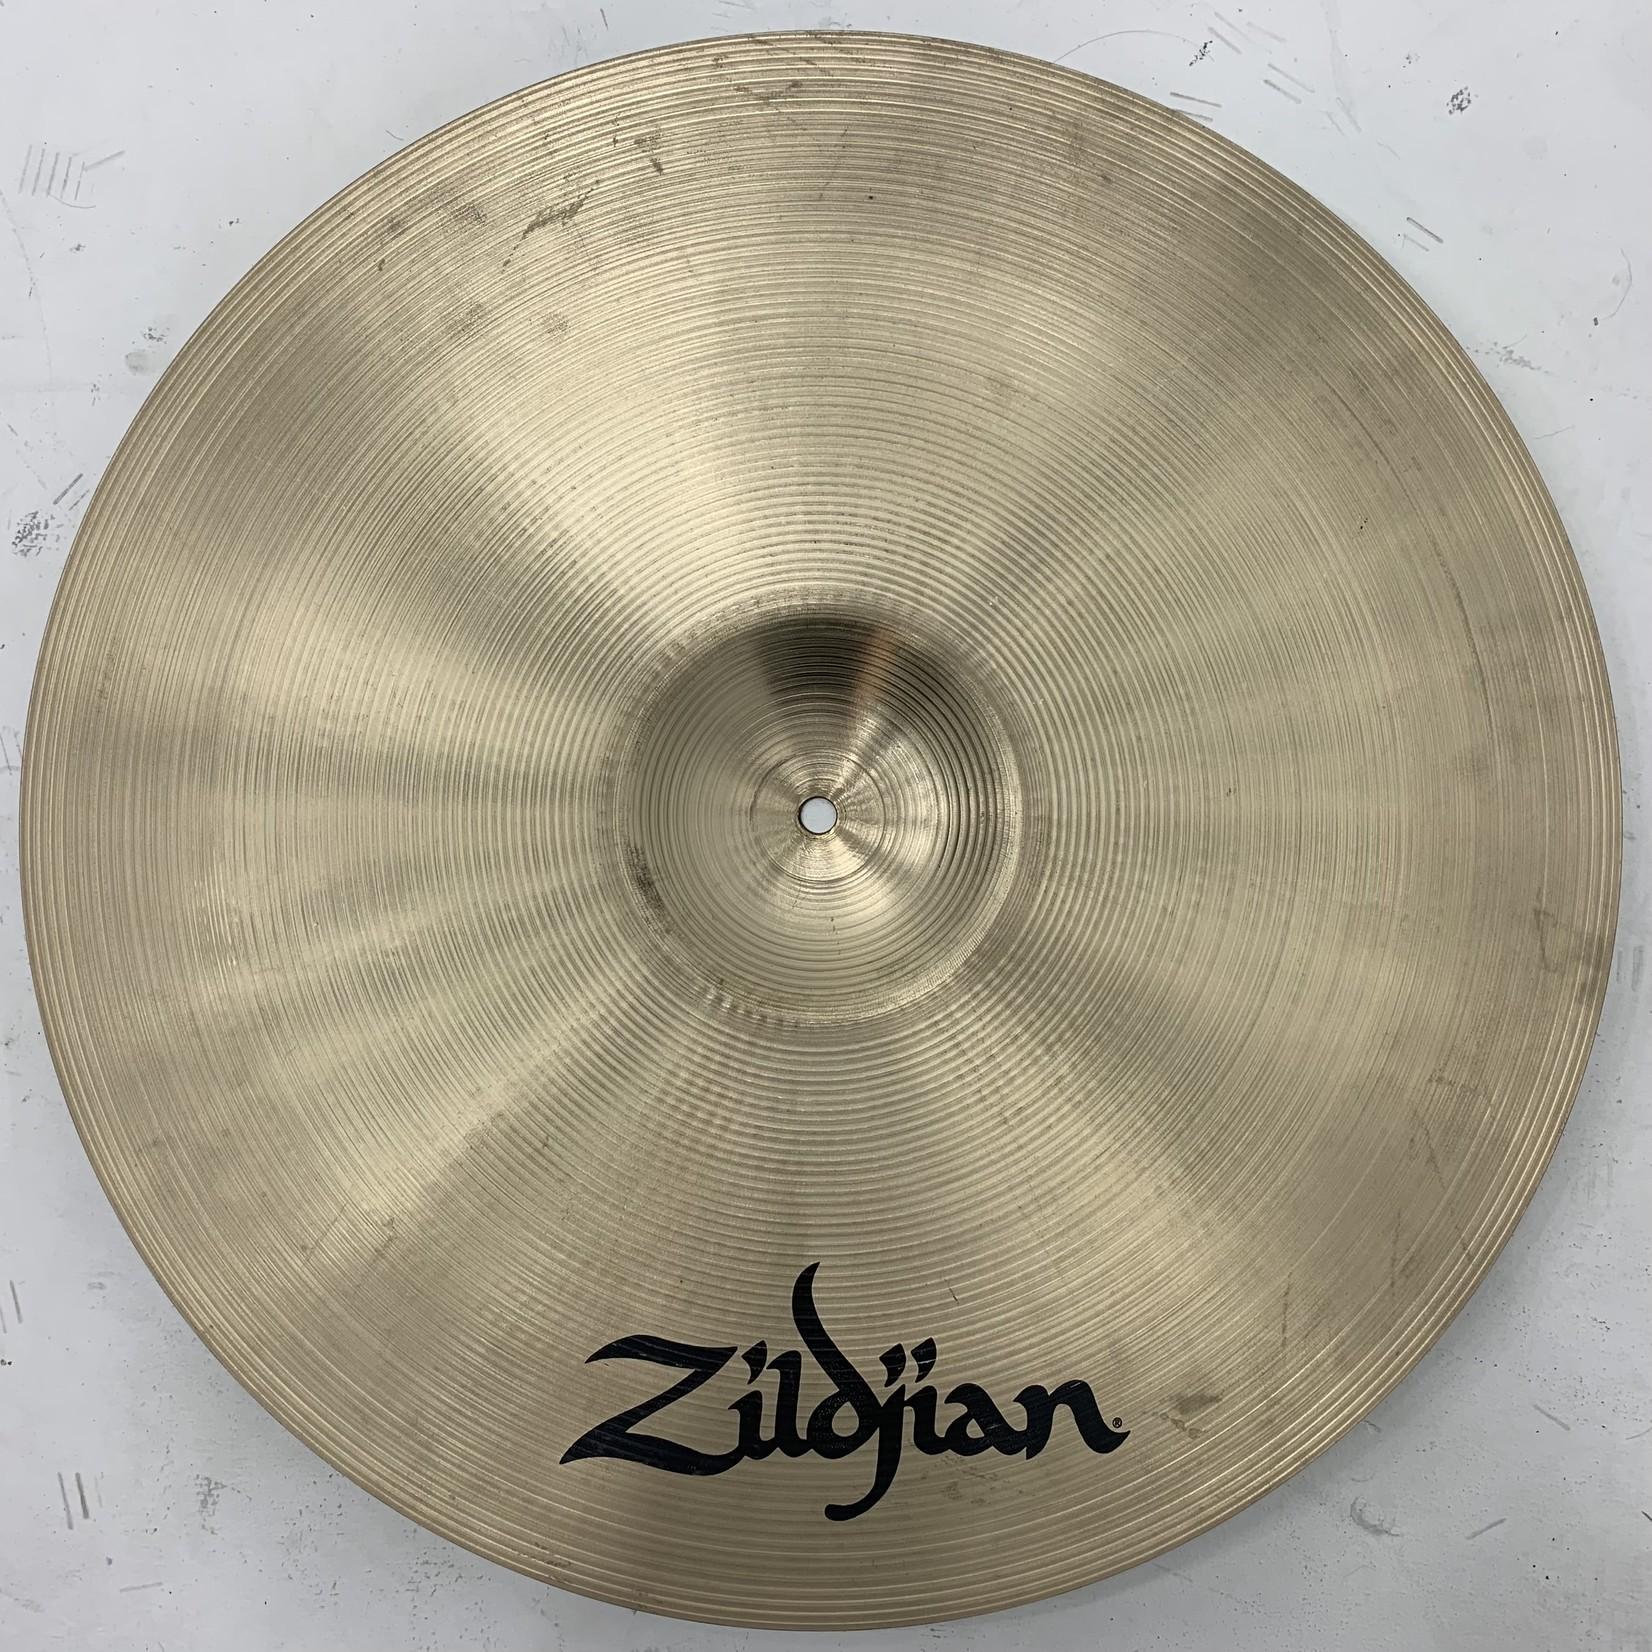 "USED Zildjian A 21"" Rock Ride Cymbal (Michael Wagener Collection)"